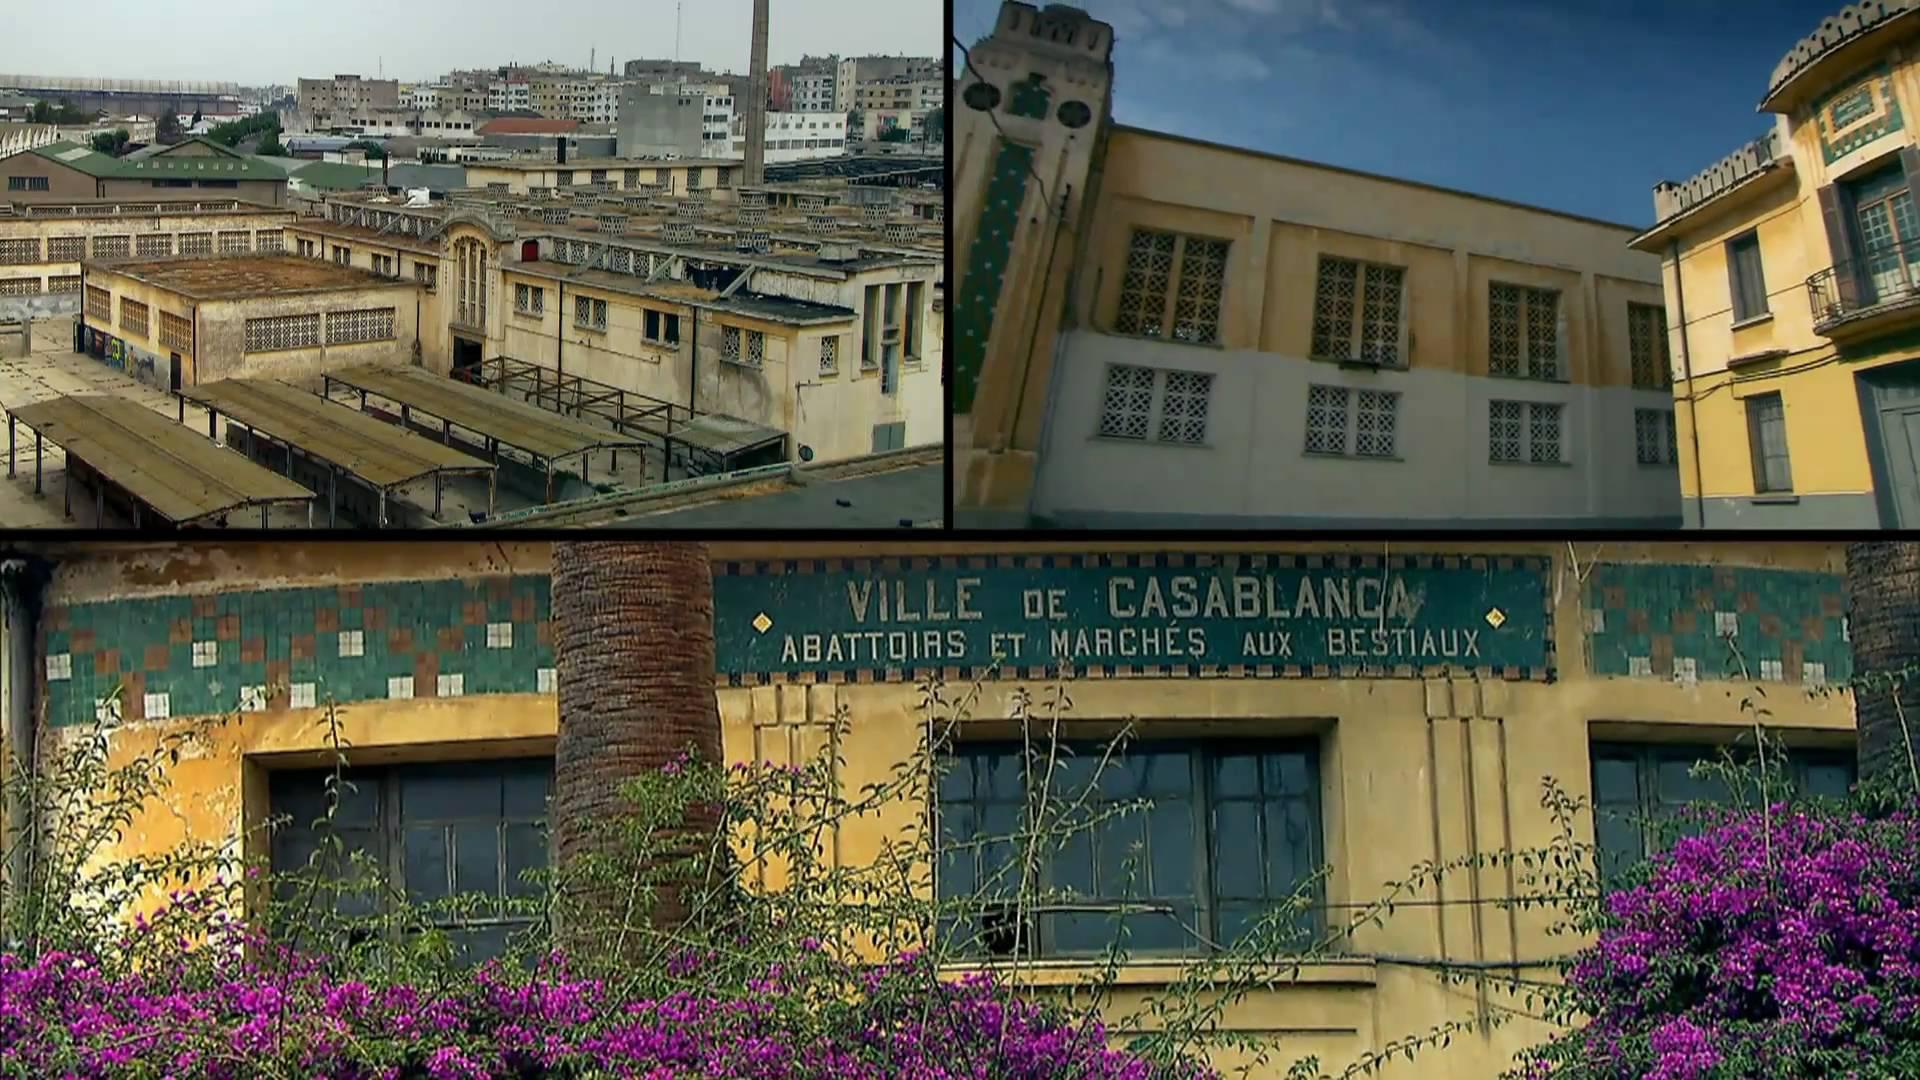 Casablanca - Patrimoine Architectural